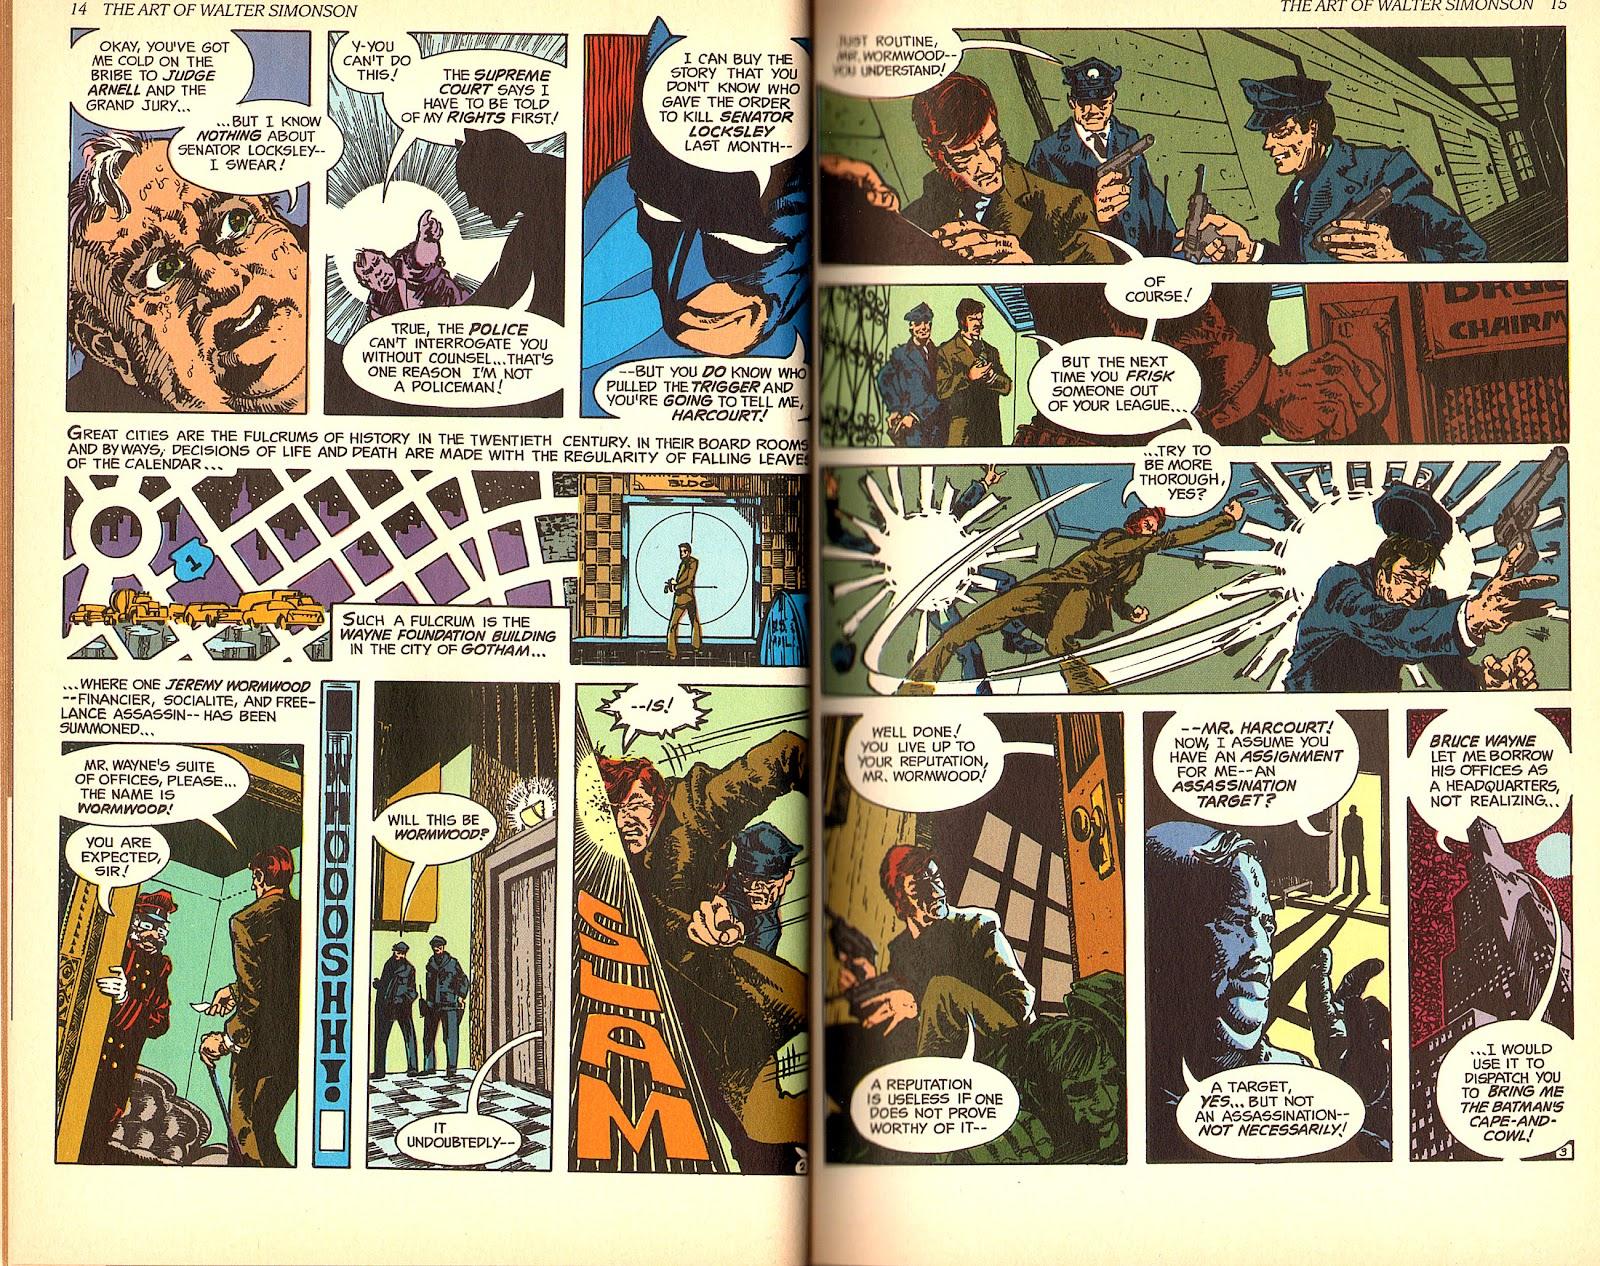 Read online The Art of Walter Simonson comic -  Issue # TPB - 9